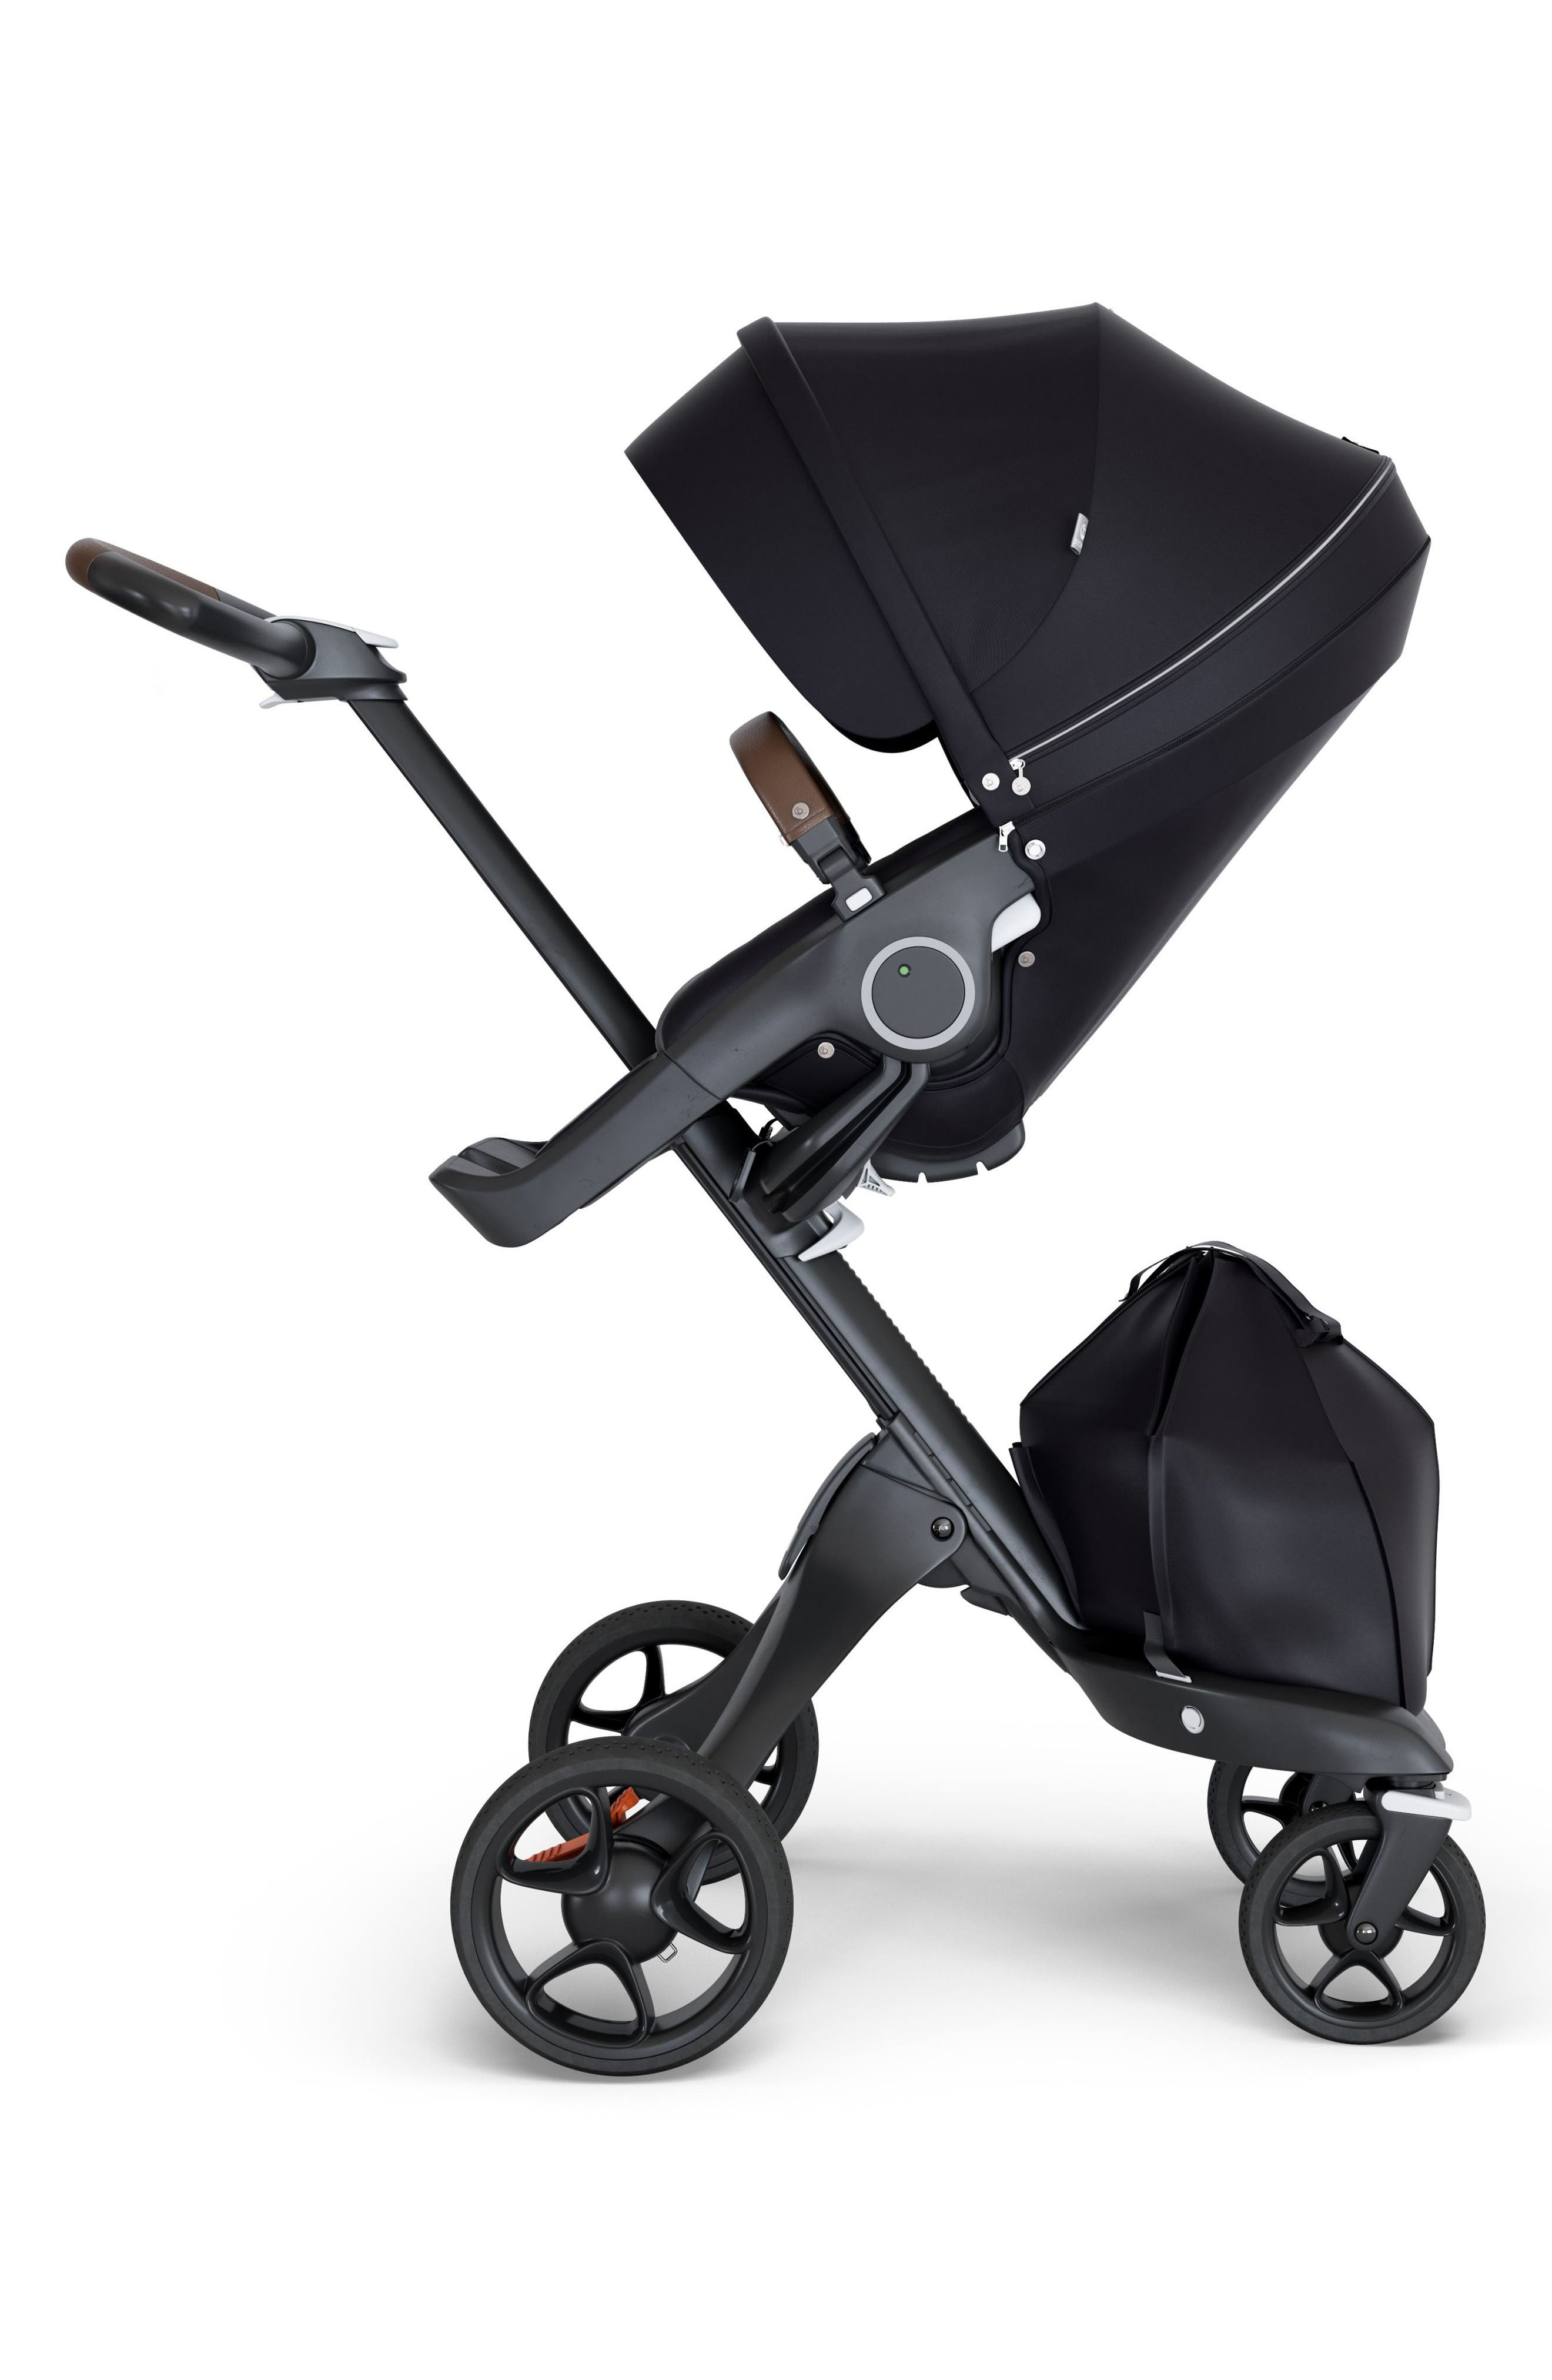 Xplory<sup>®</sup> Black Chassis Stroller,                             Main thumbnail 1, color,                             Black